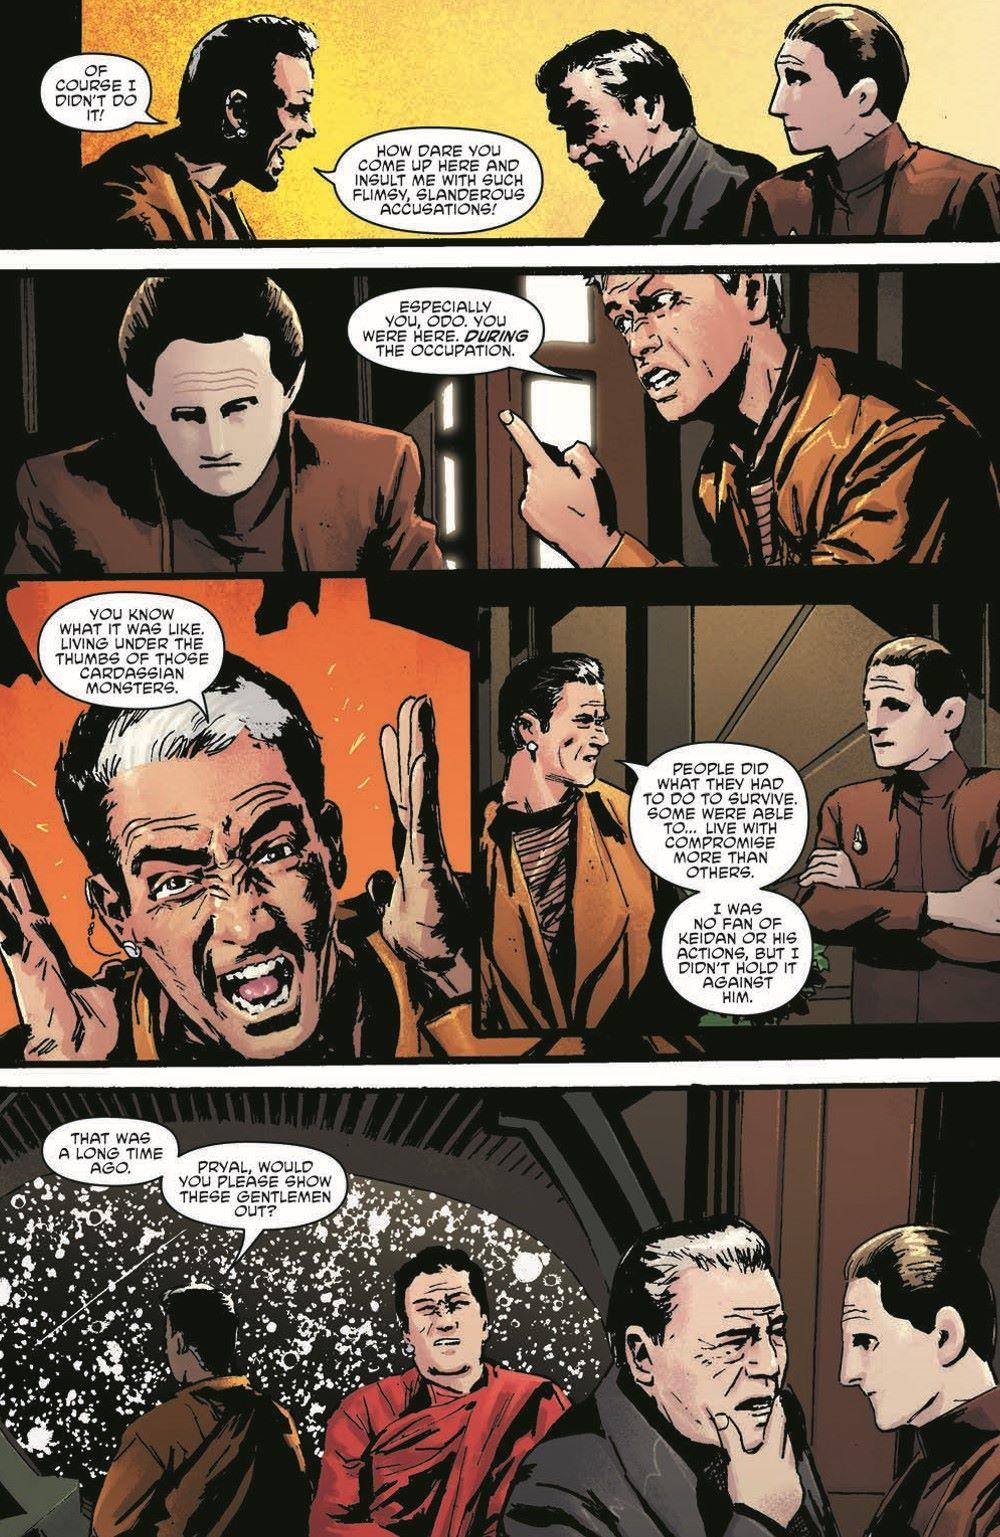 ST_DS9_04-pr-5 ComicList Previews: STAR TREK DEEP SPACE NINE TOO LONG A SACRIFICE #4 (OF 4)